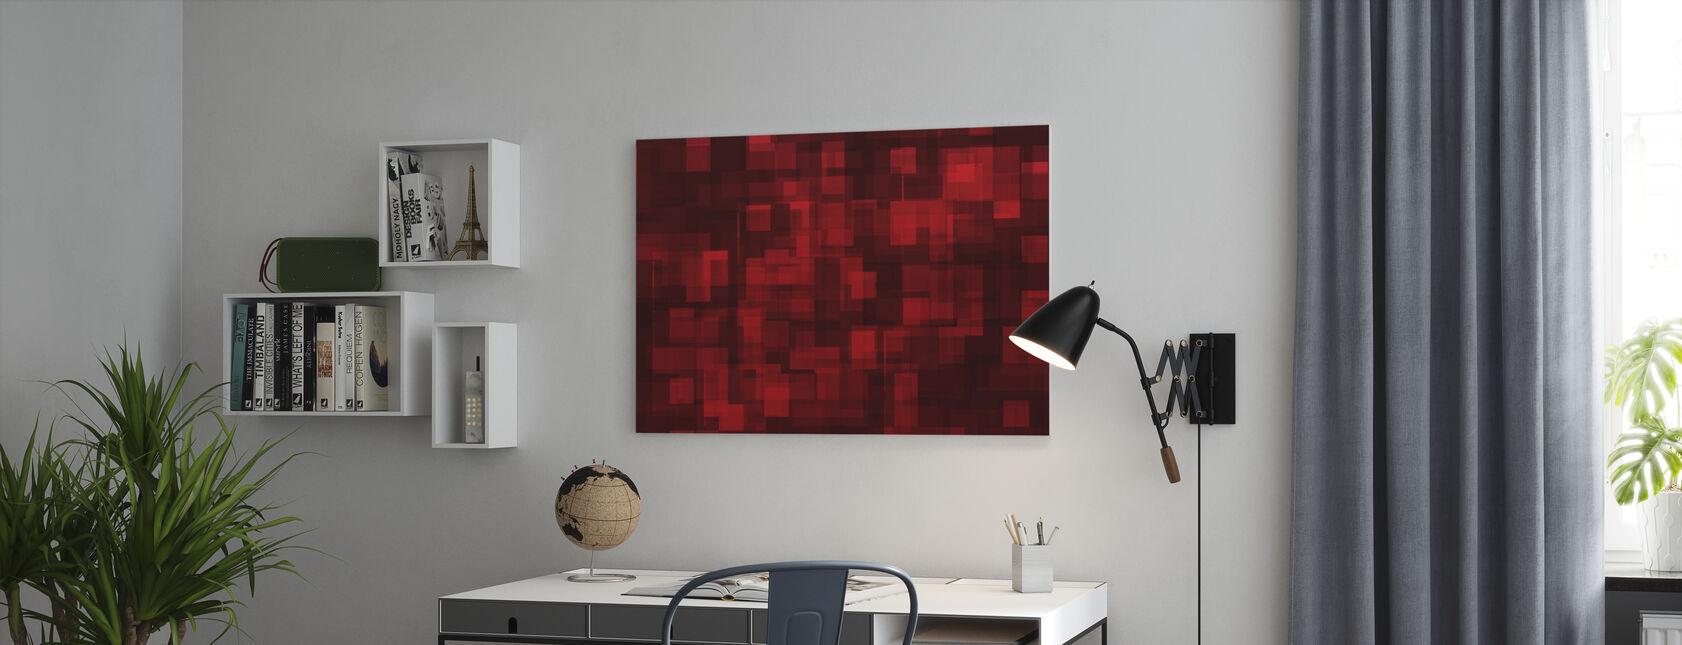 Chaotisch Rood - Canvas print - Kantoor